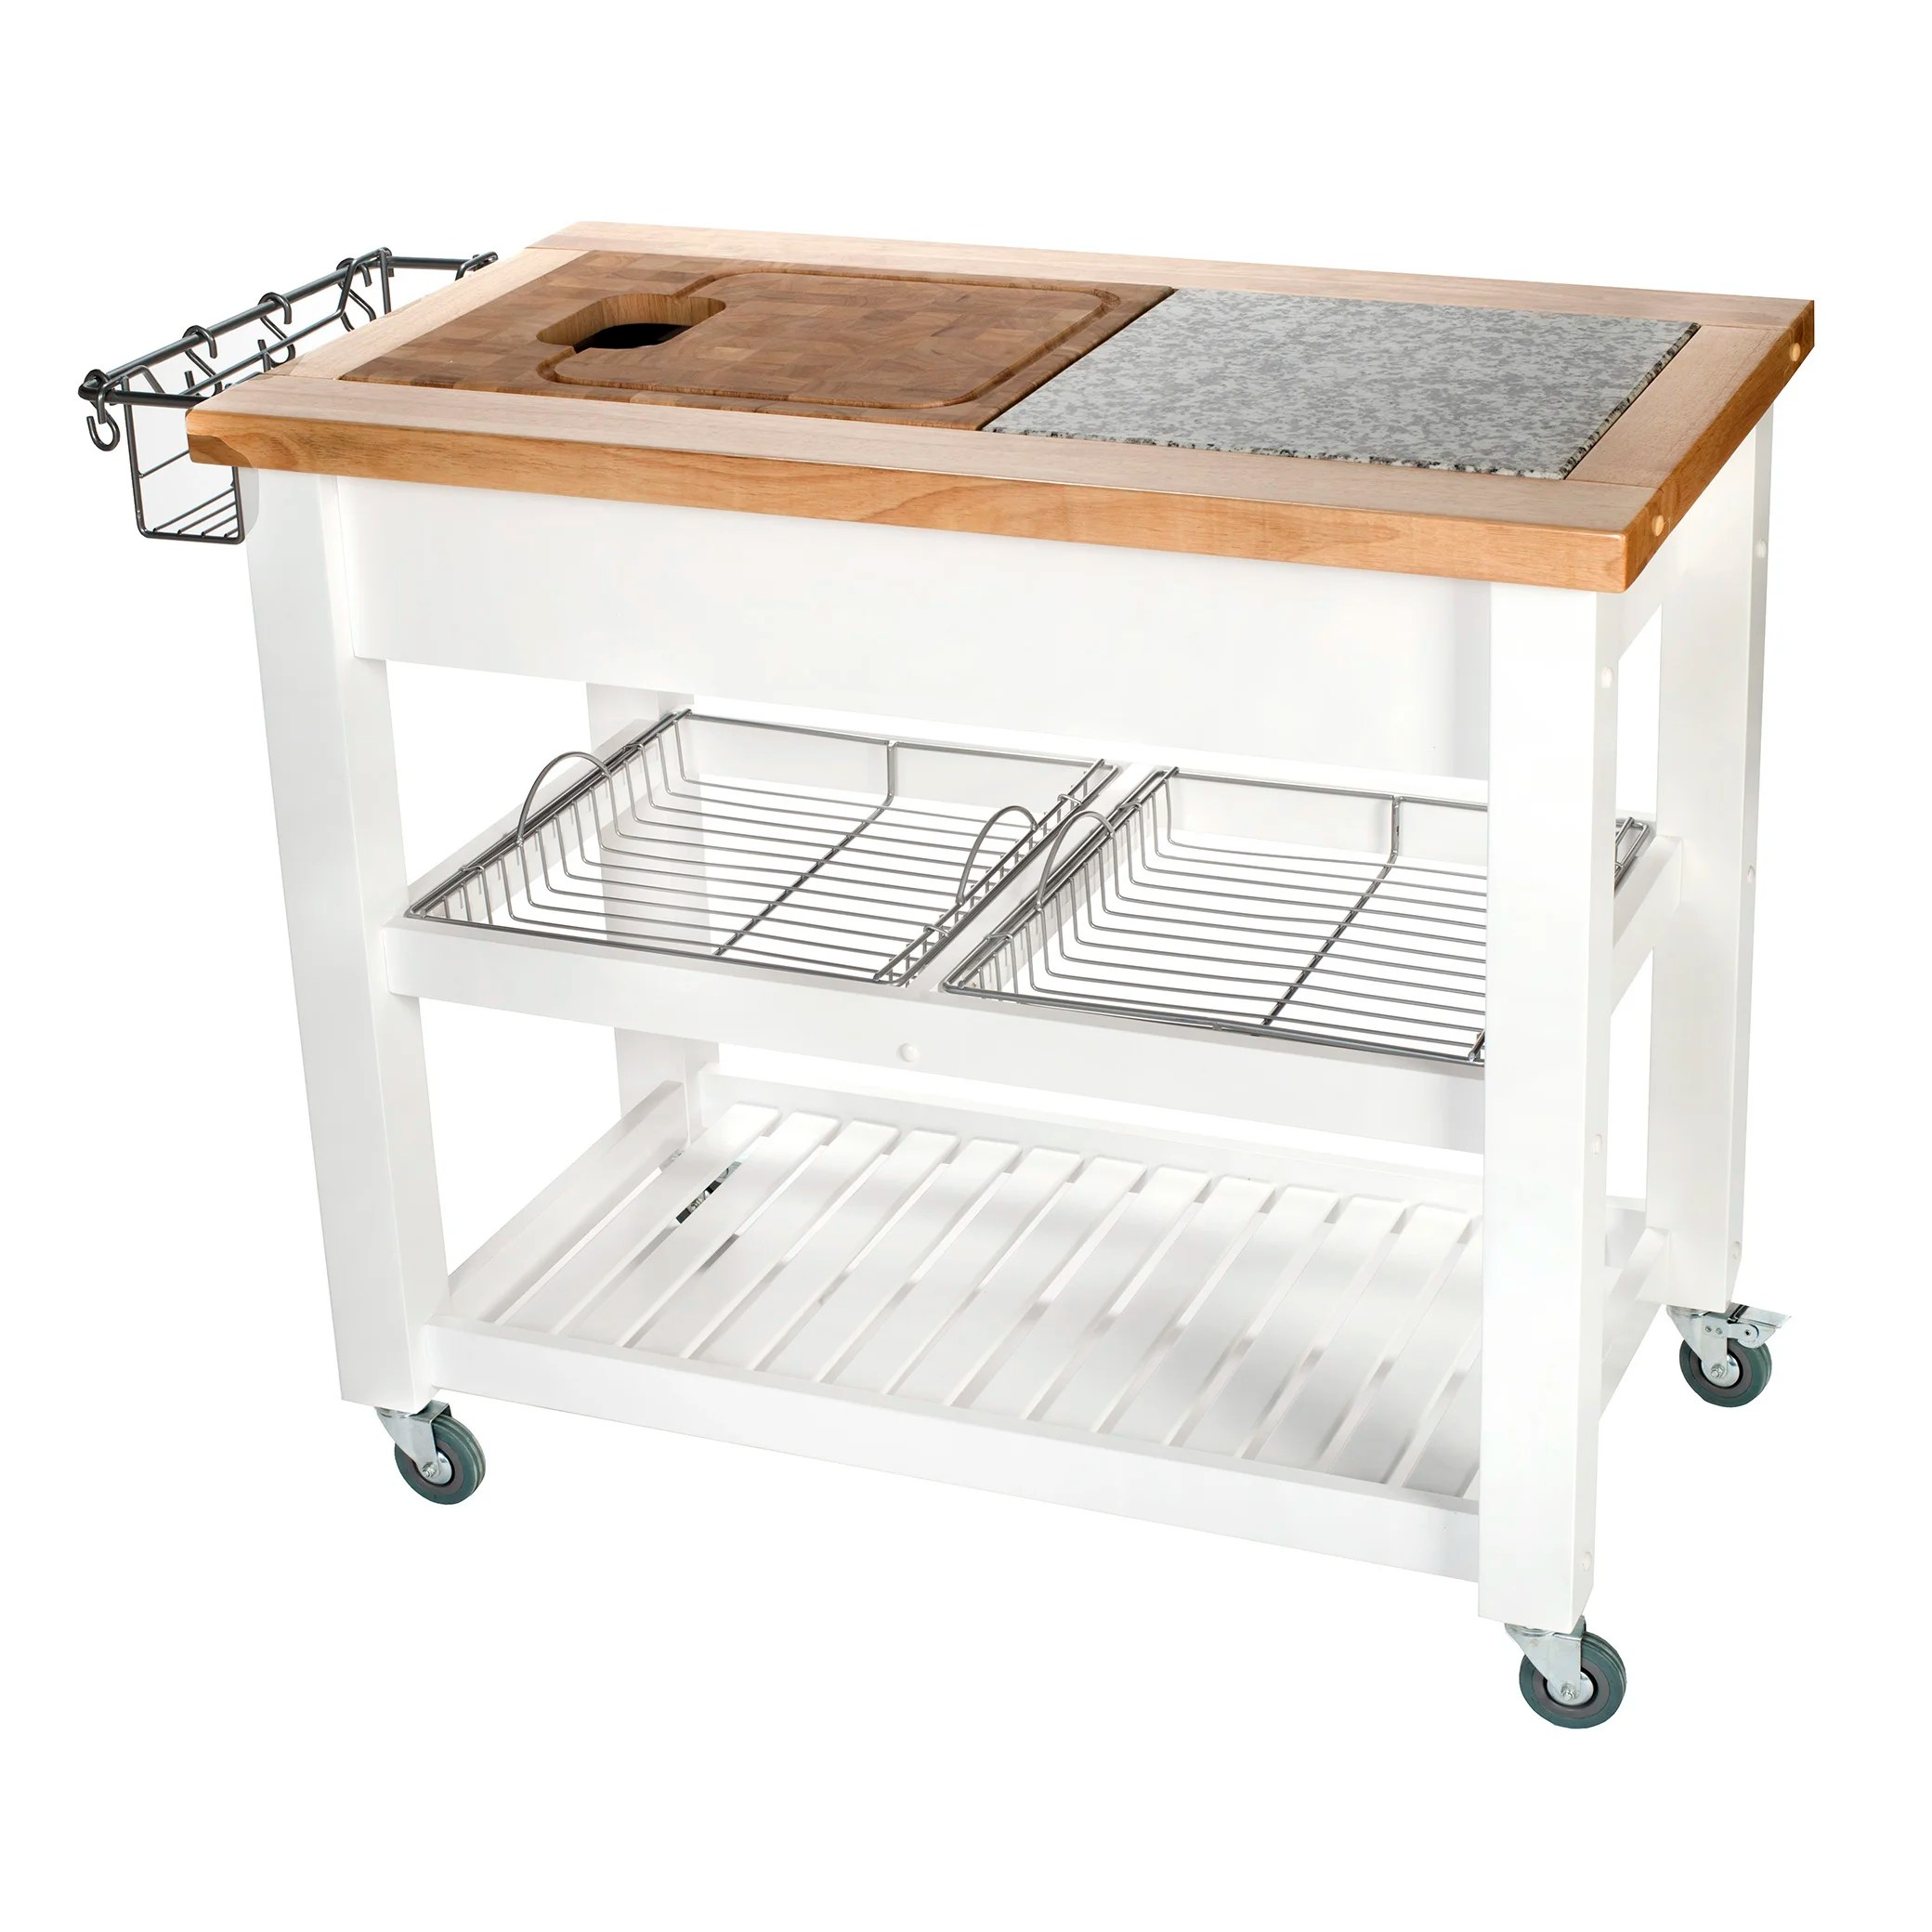 chris and kitchen cart designs of small modular pro chef island reviews wayfair